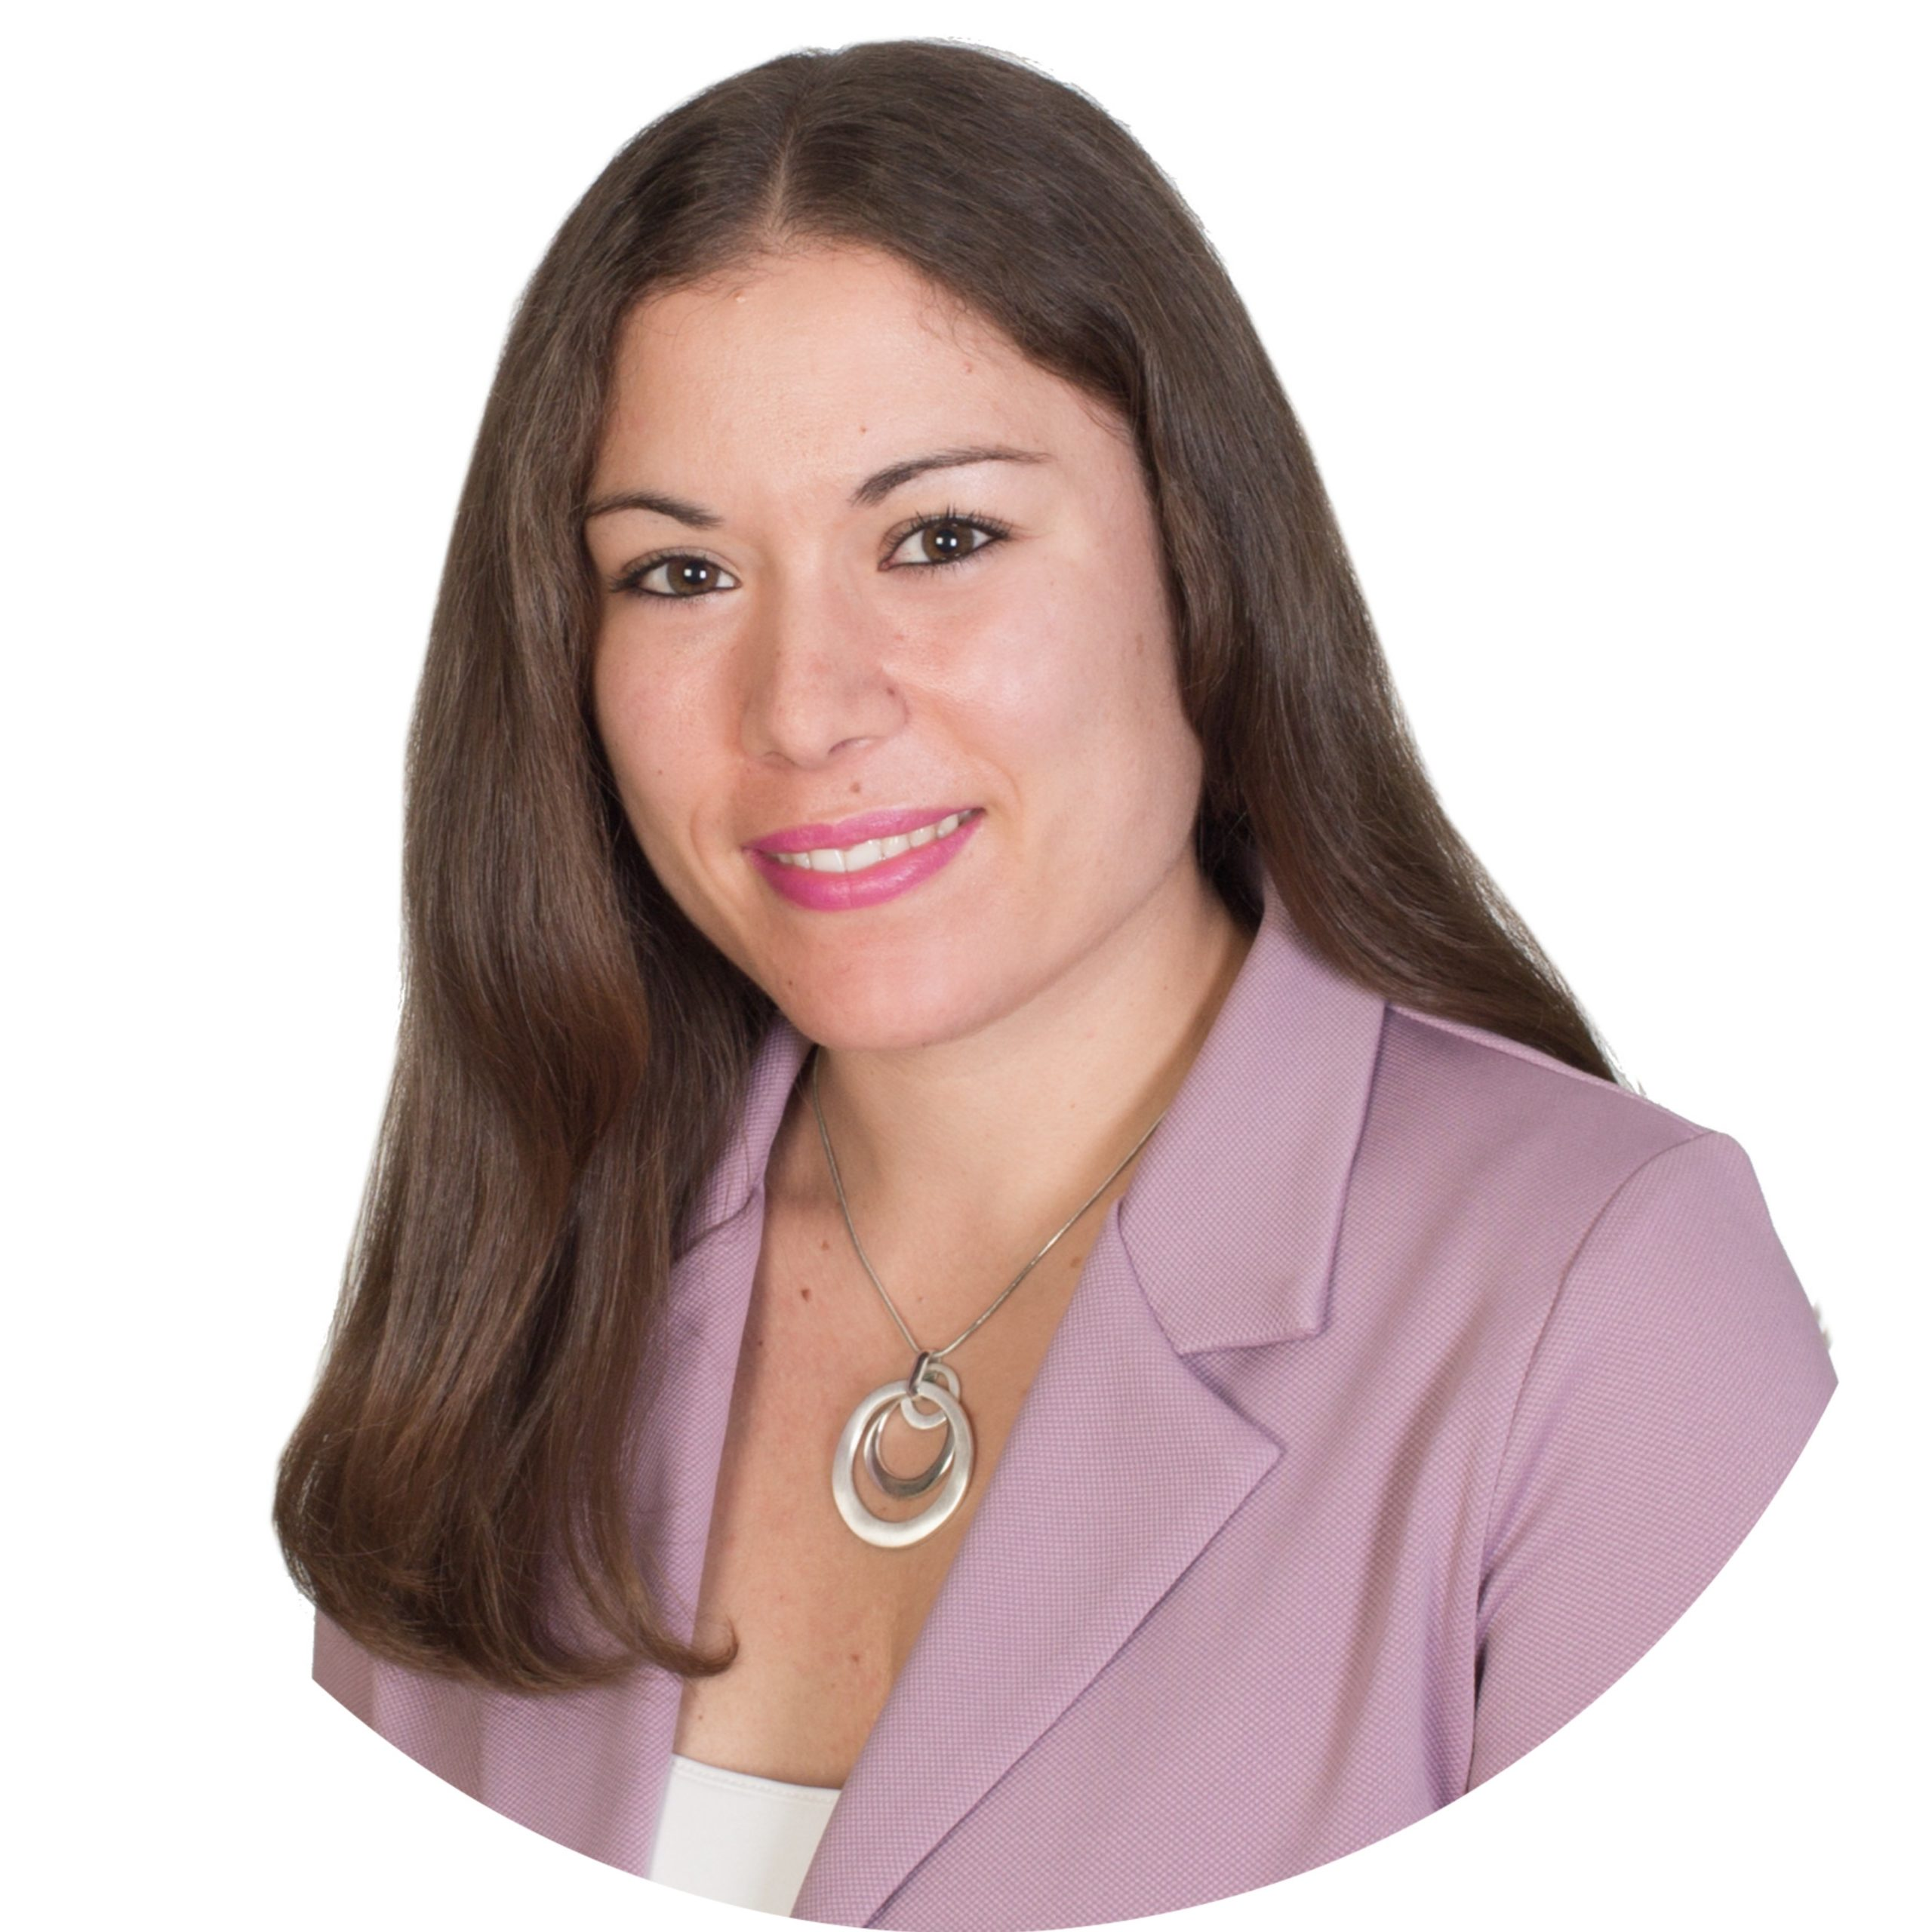 Carolina Gil